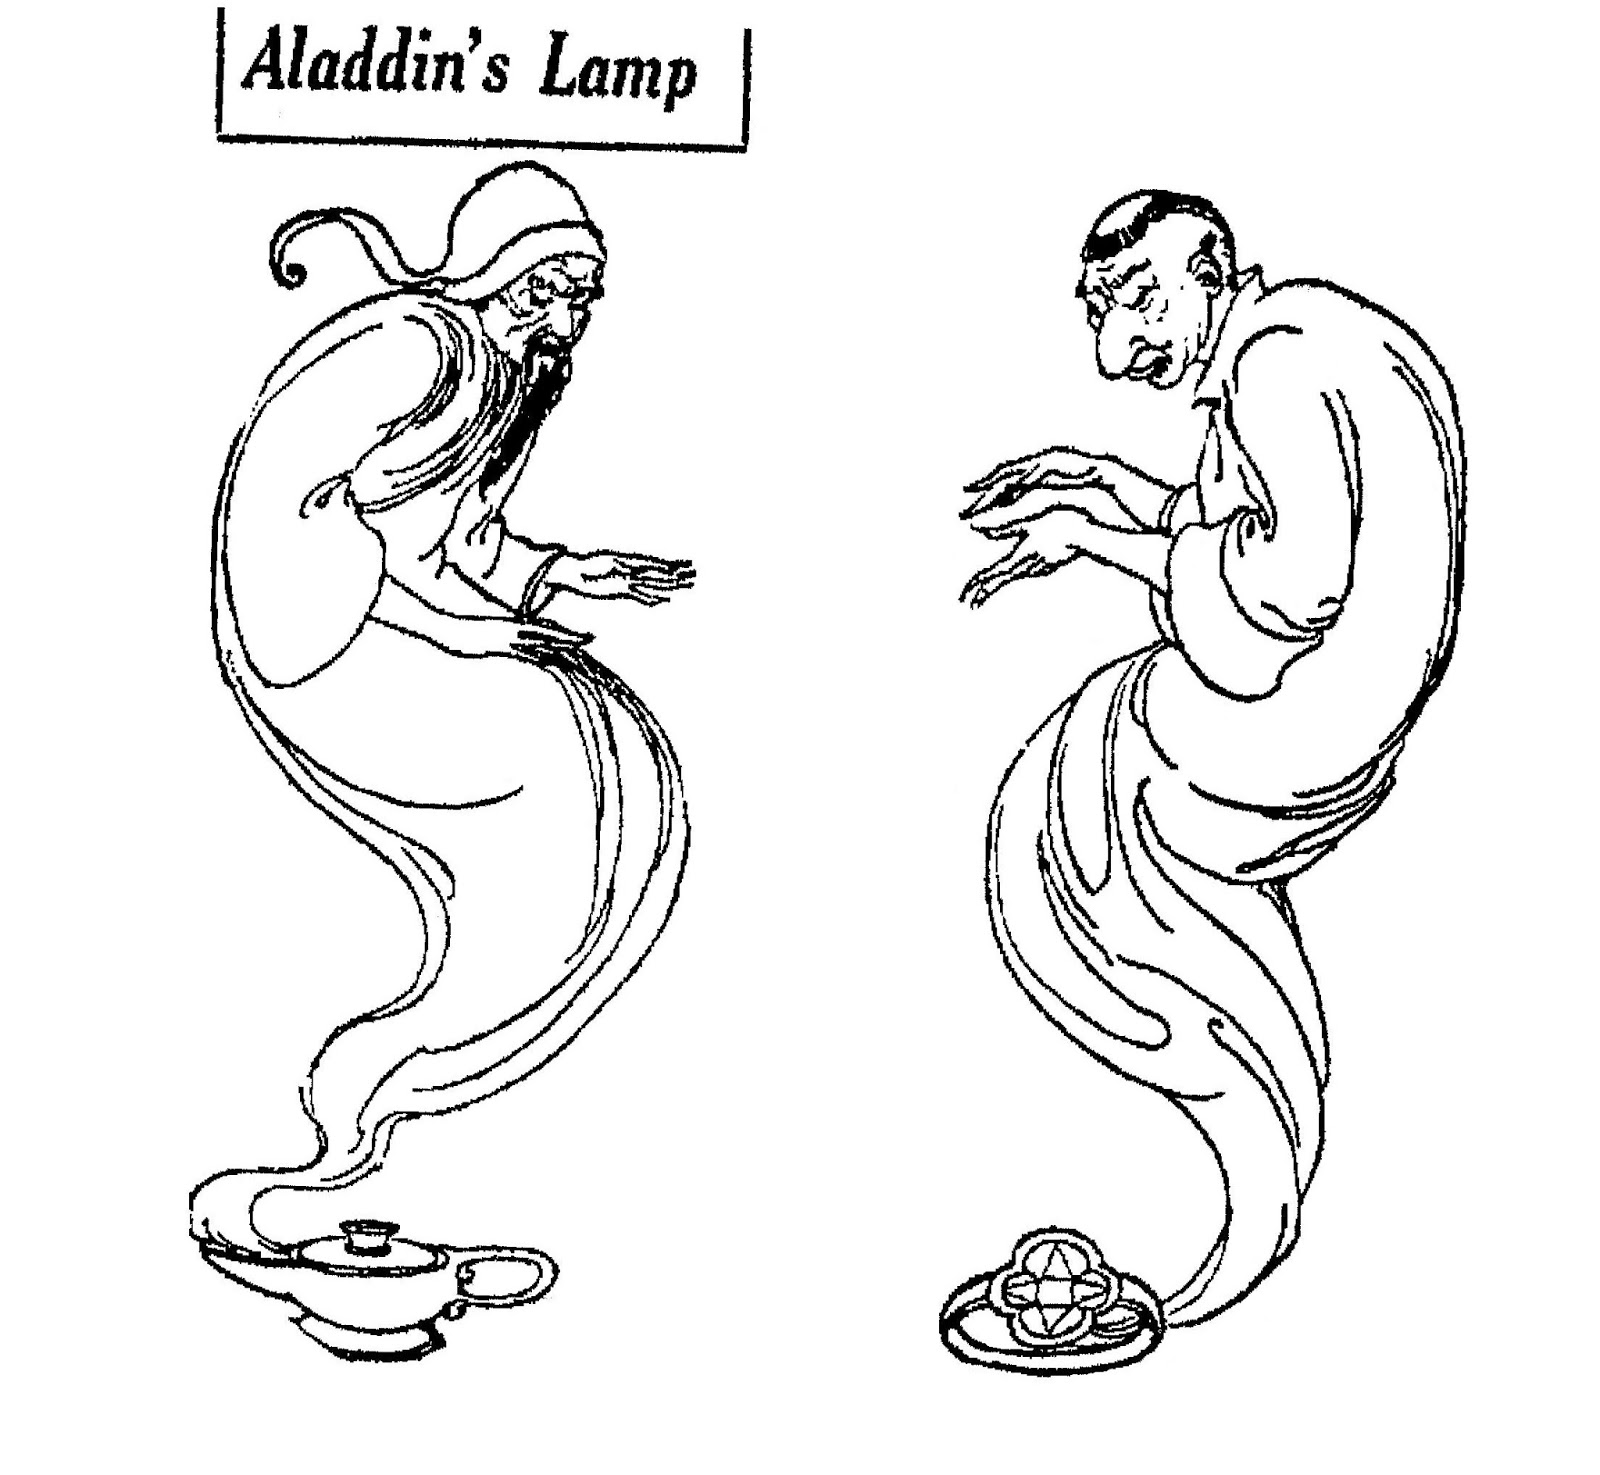 1600x1475 Aladdin's Lamp Paper Doll Cut Outs June 1925 Wonderful Genie